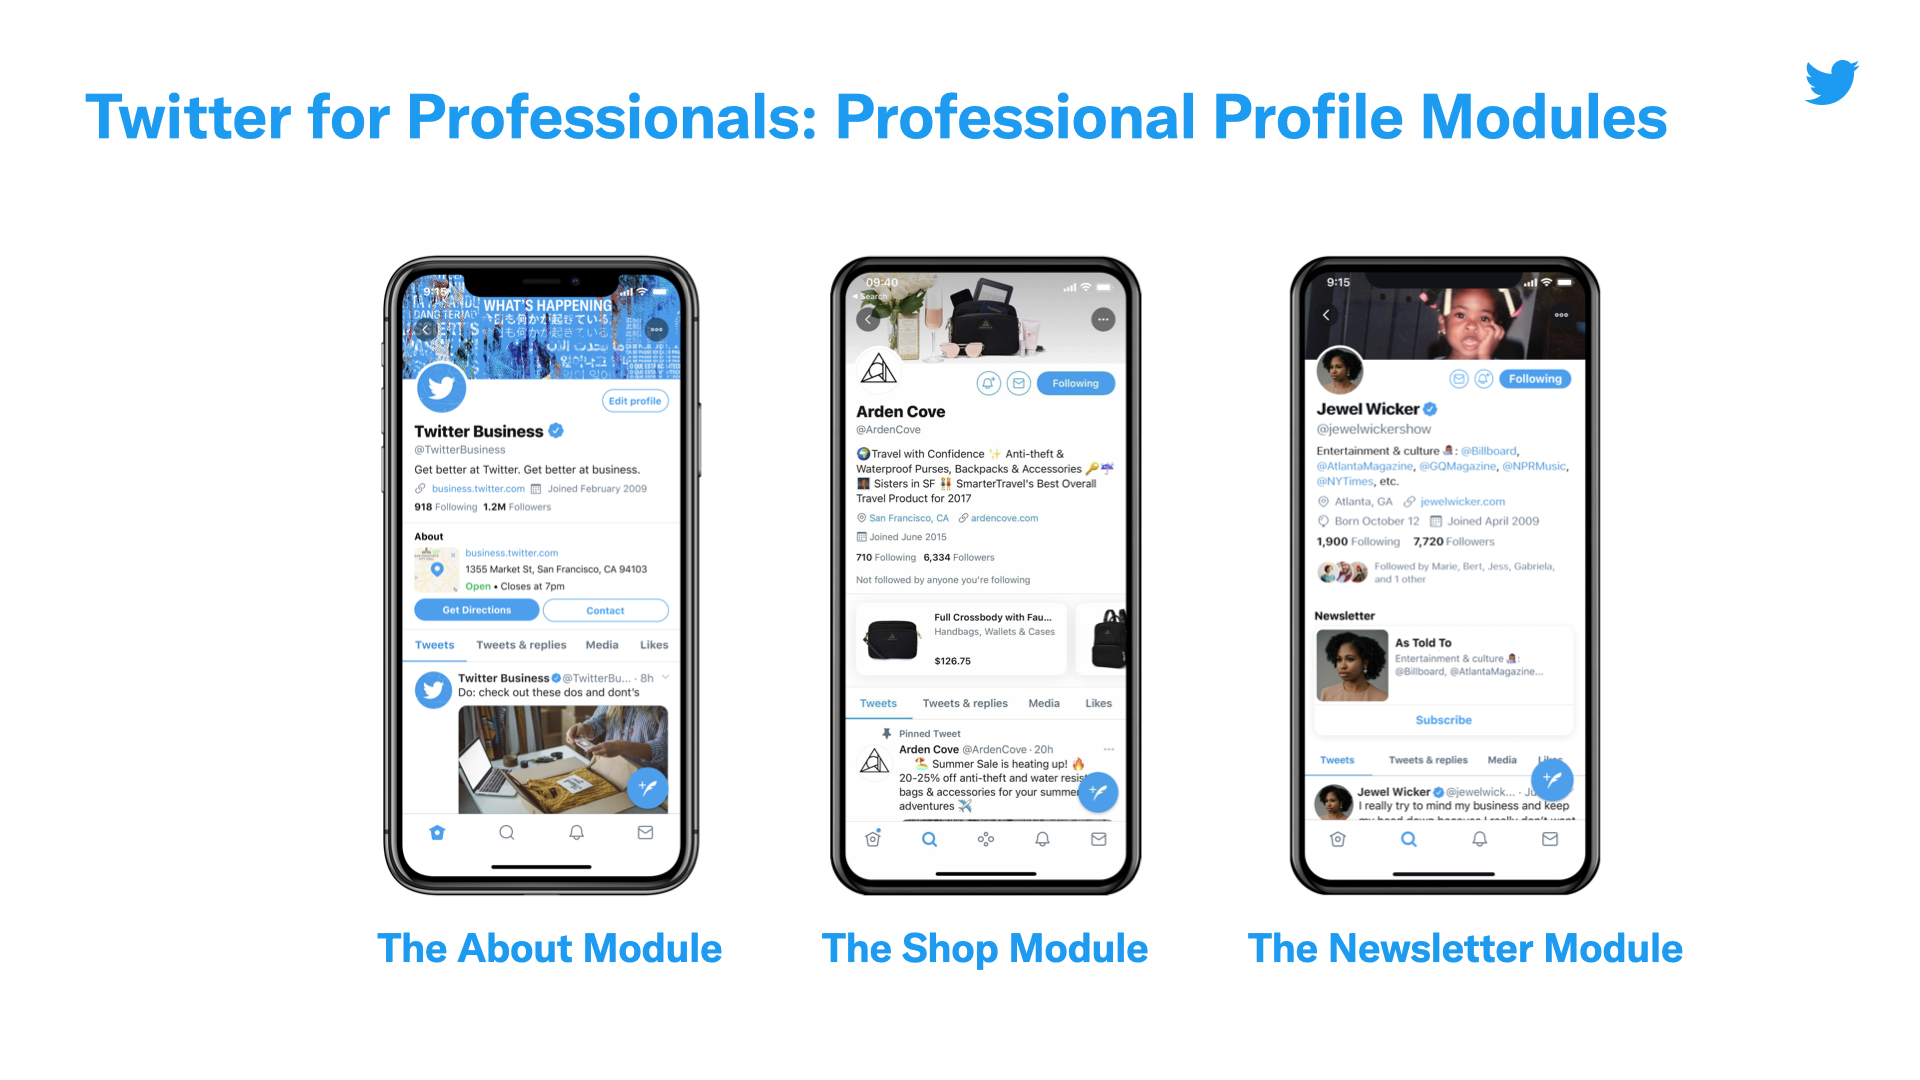 perfil profesional de twitter